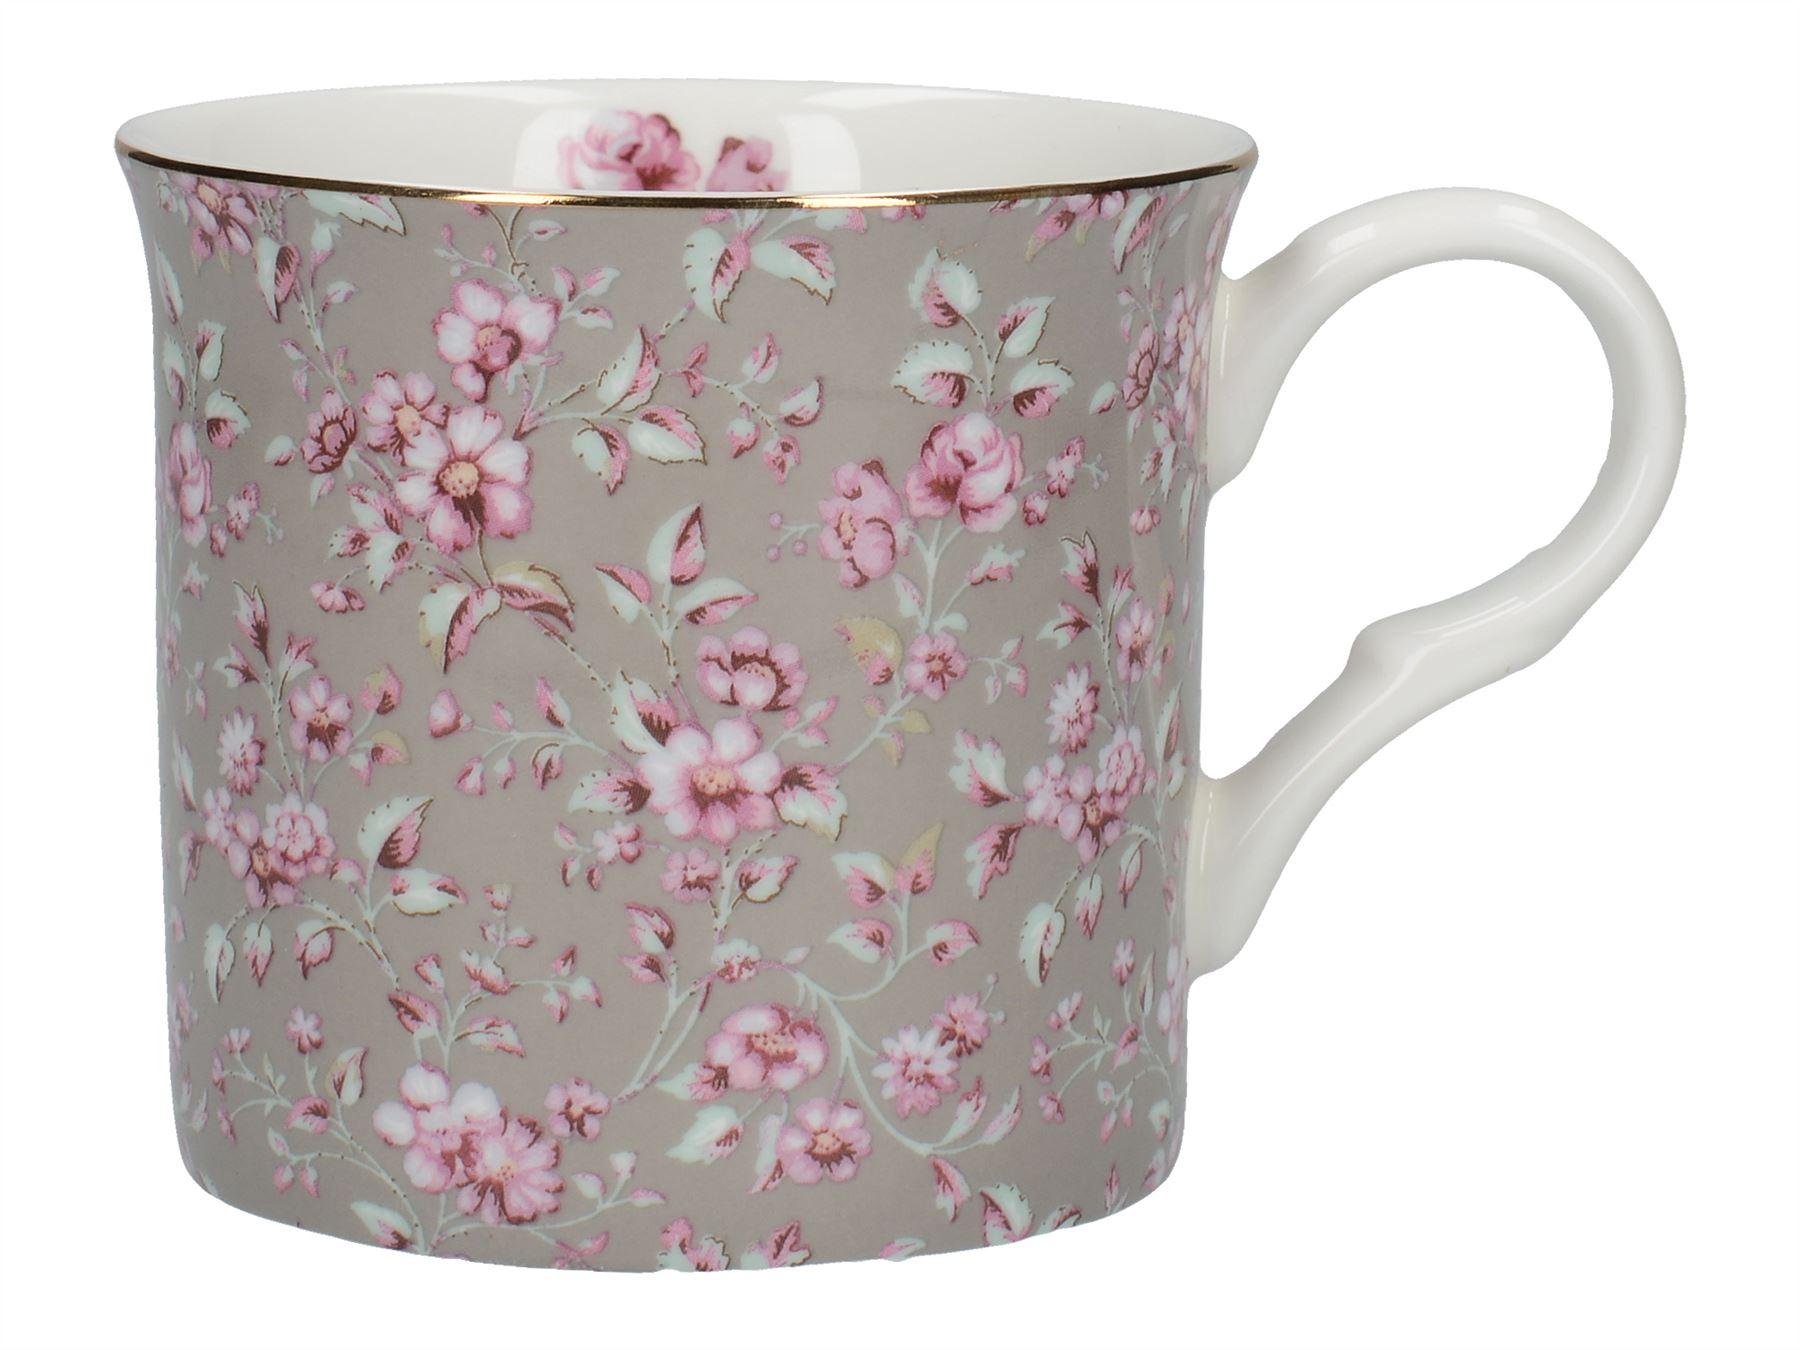 Katie Alice Ditsy Floral Palce Mug Grey Floral 5050993070714  cc037a61b8d